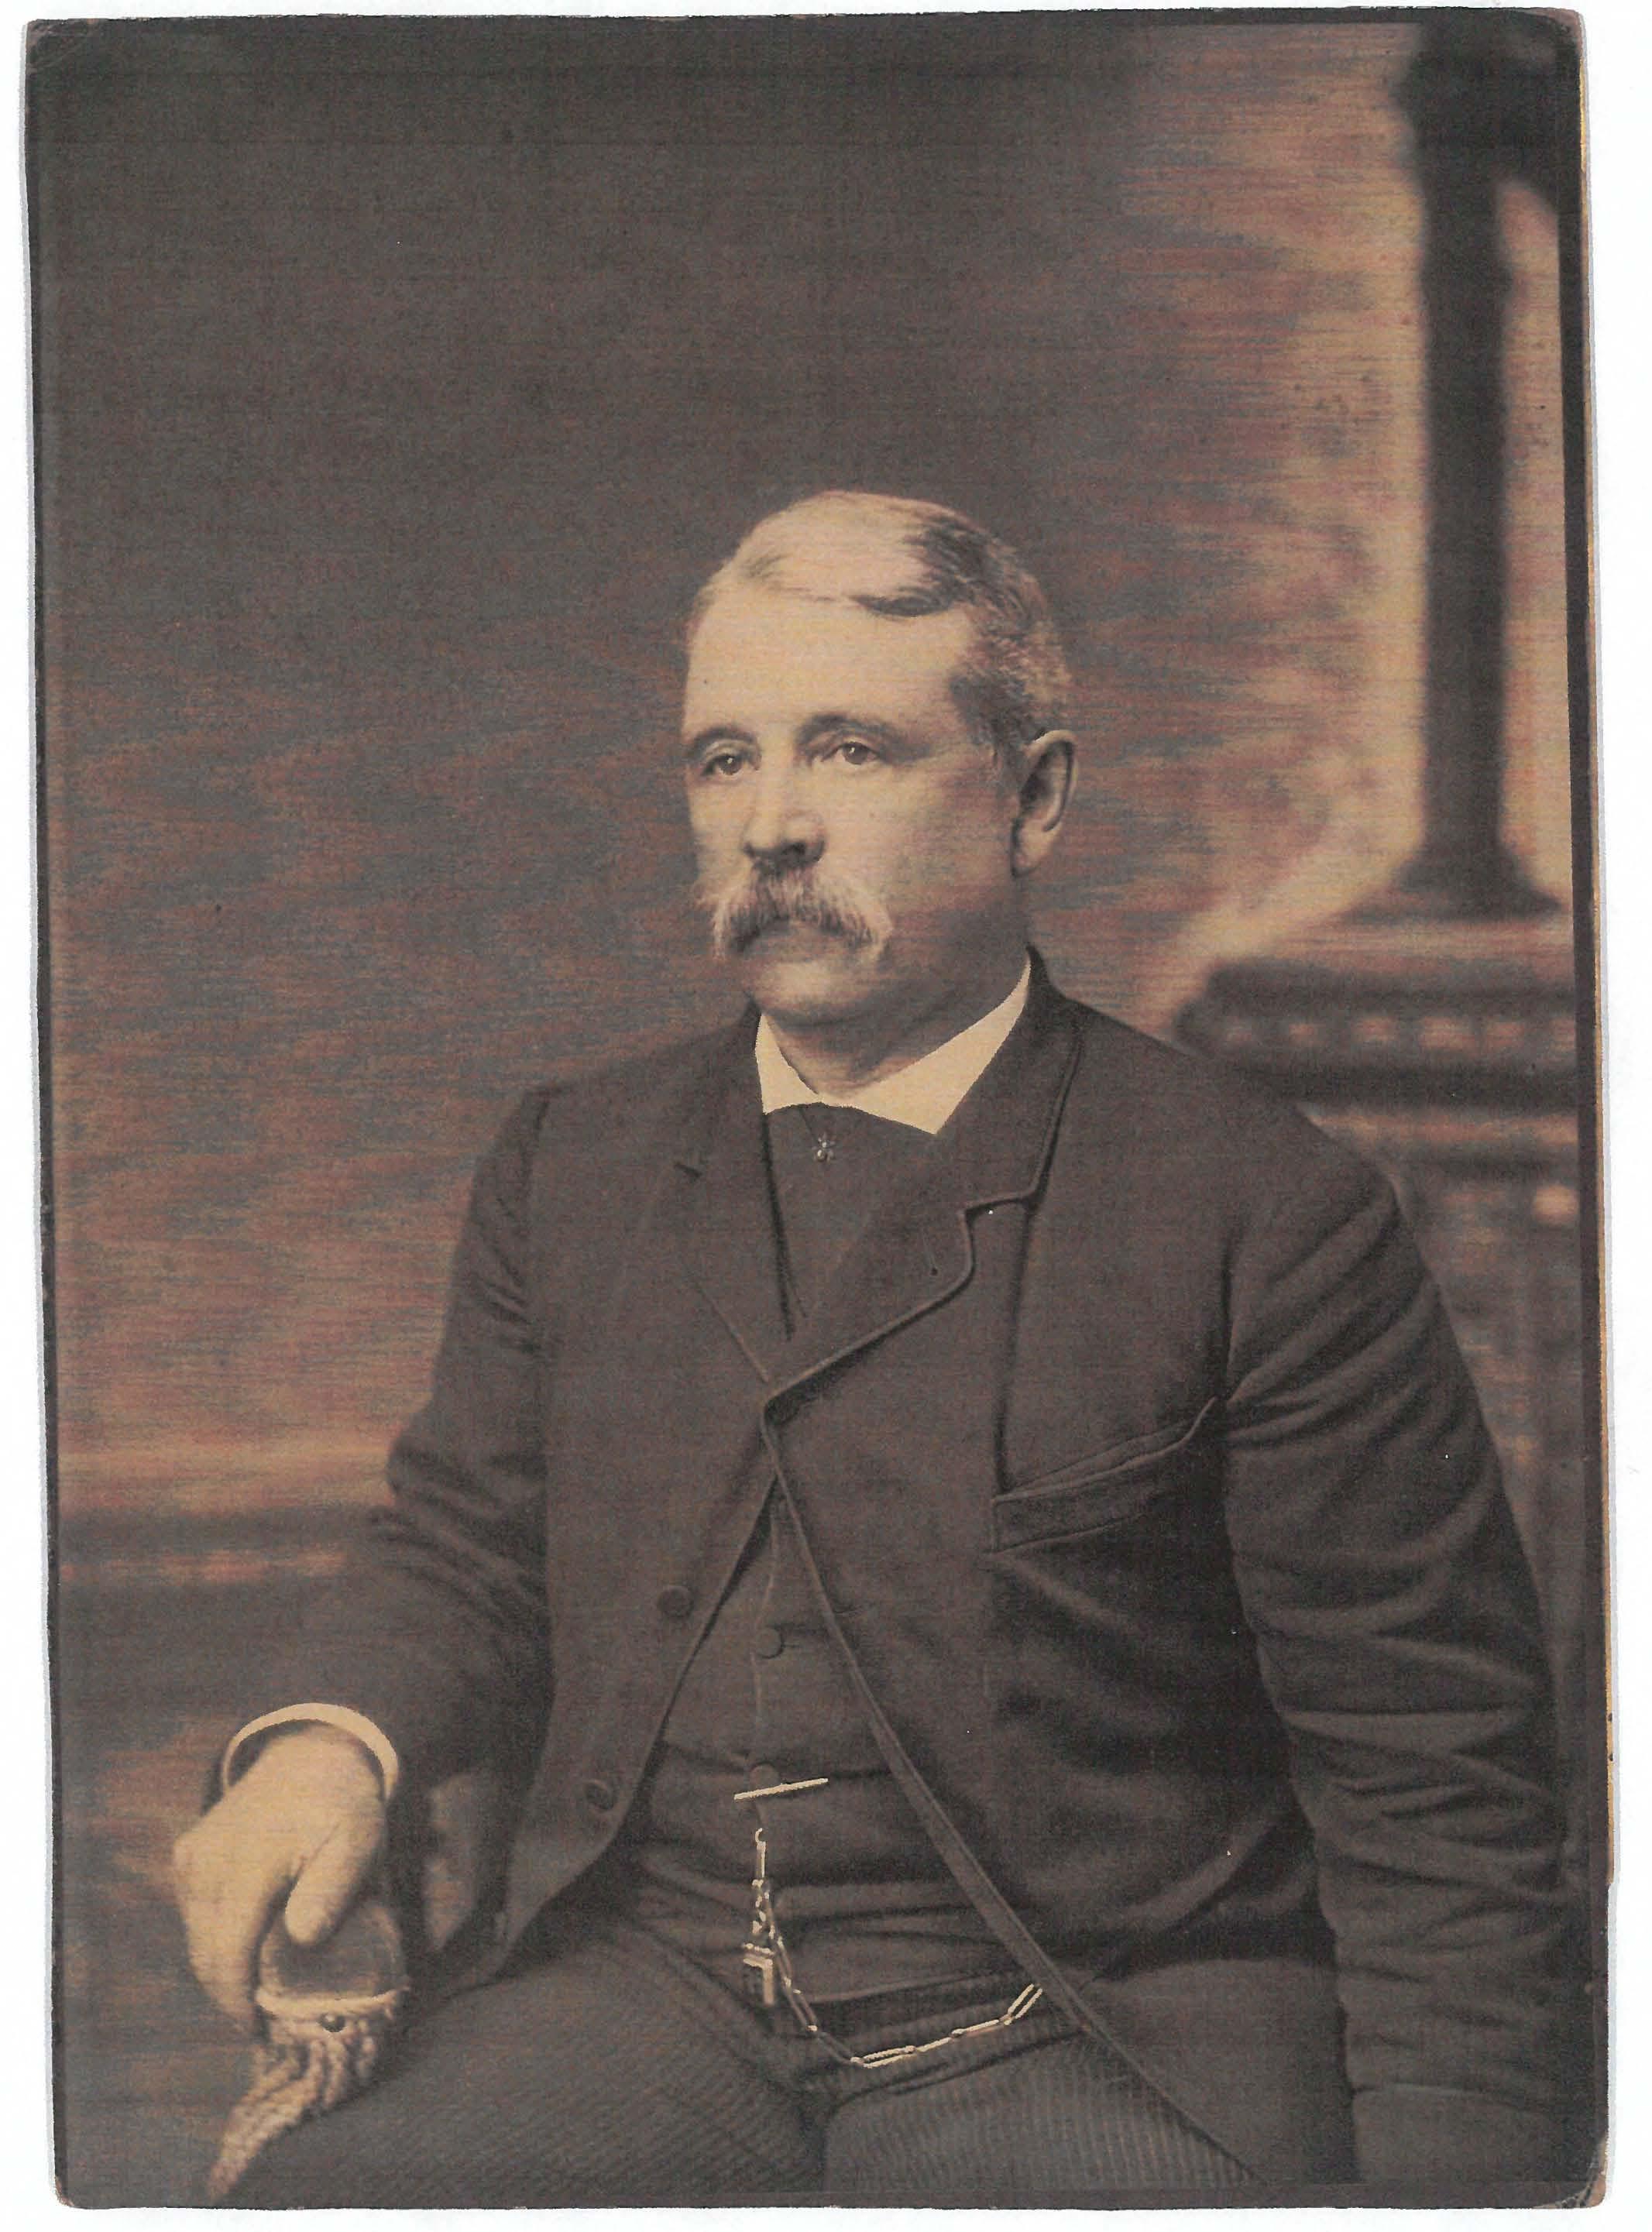 Charles B. Hazeltine, the original owner of 6 Union Park.